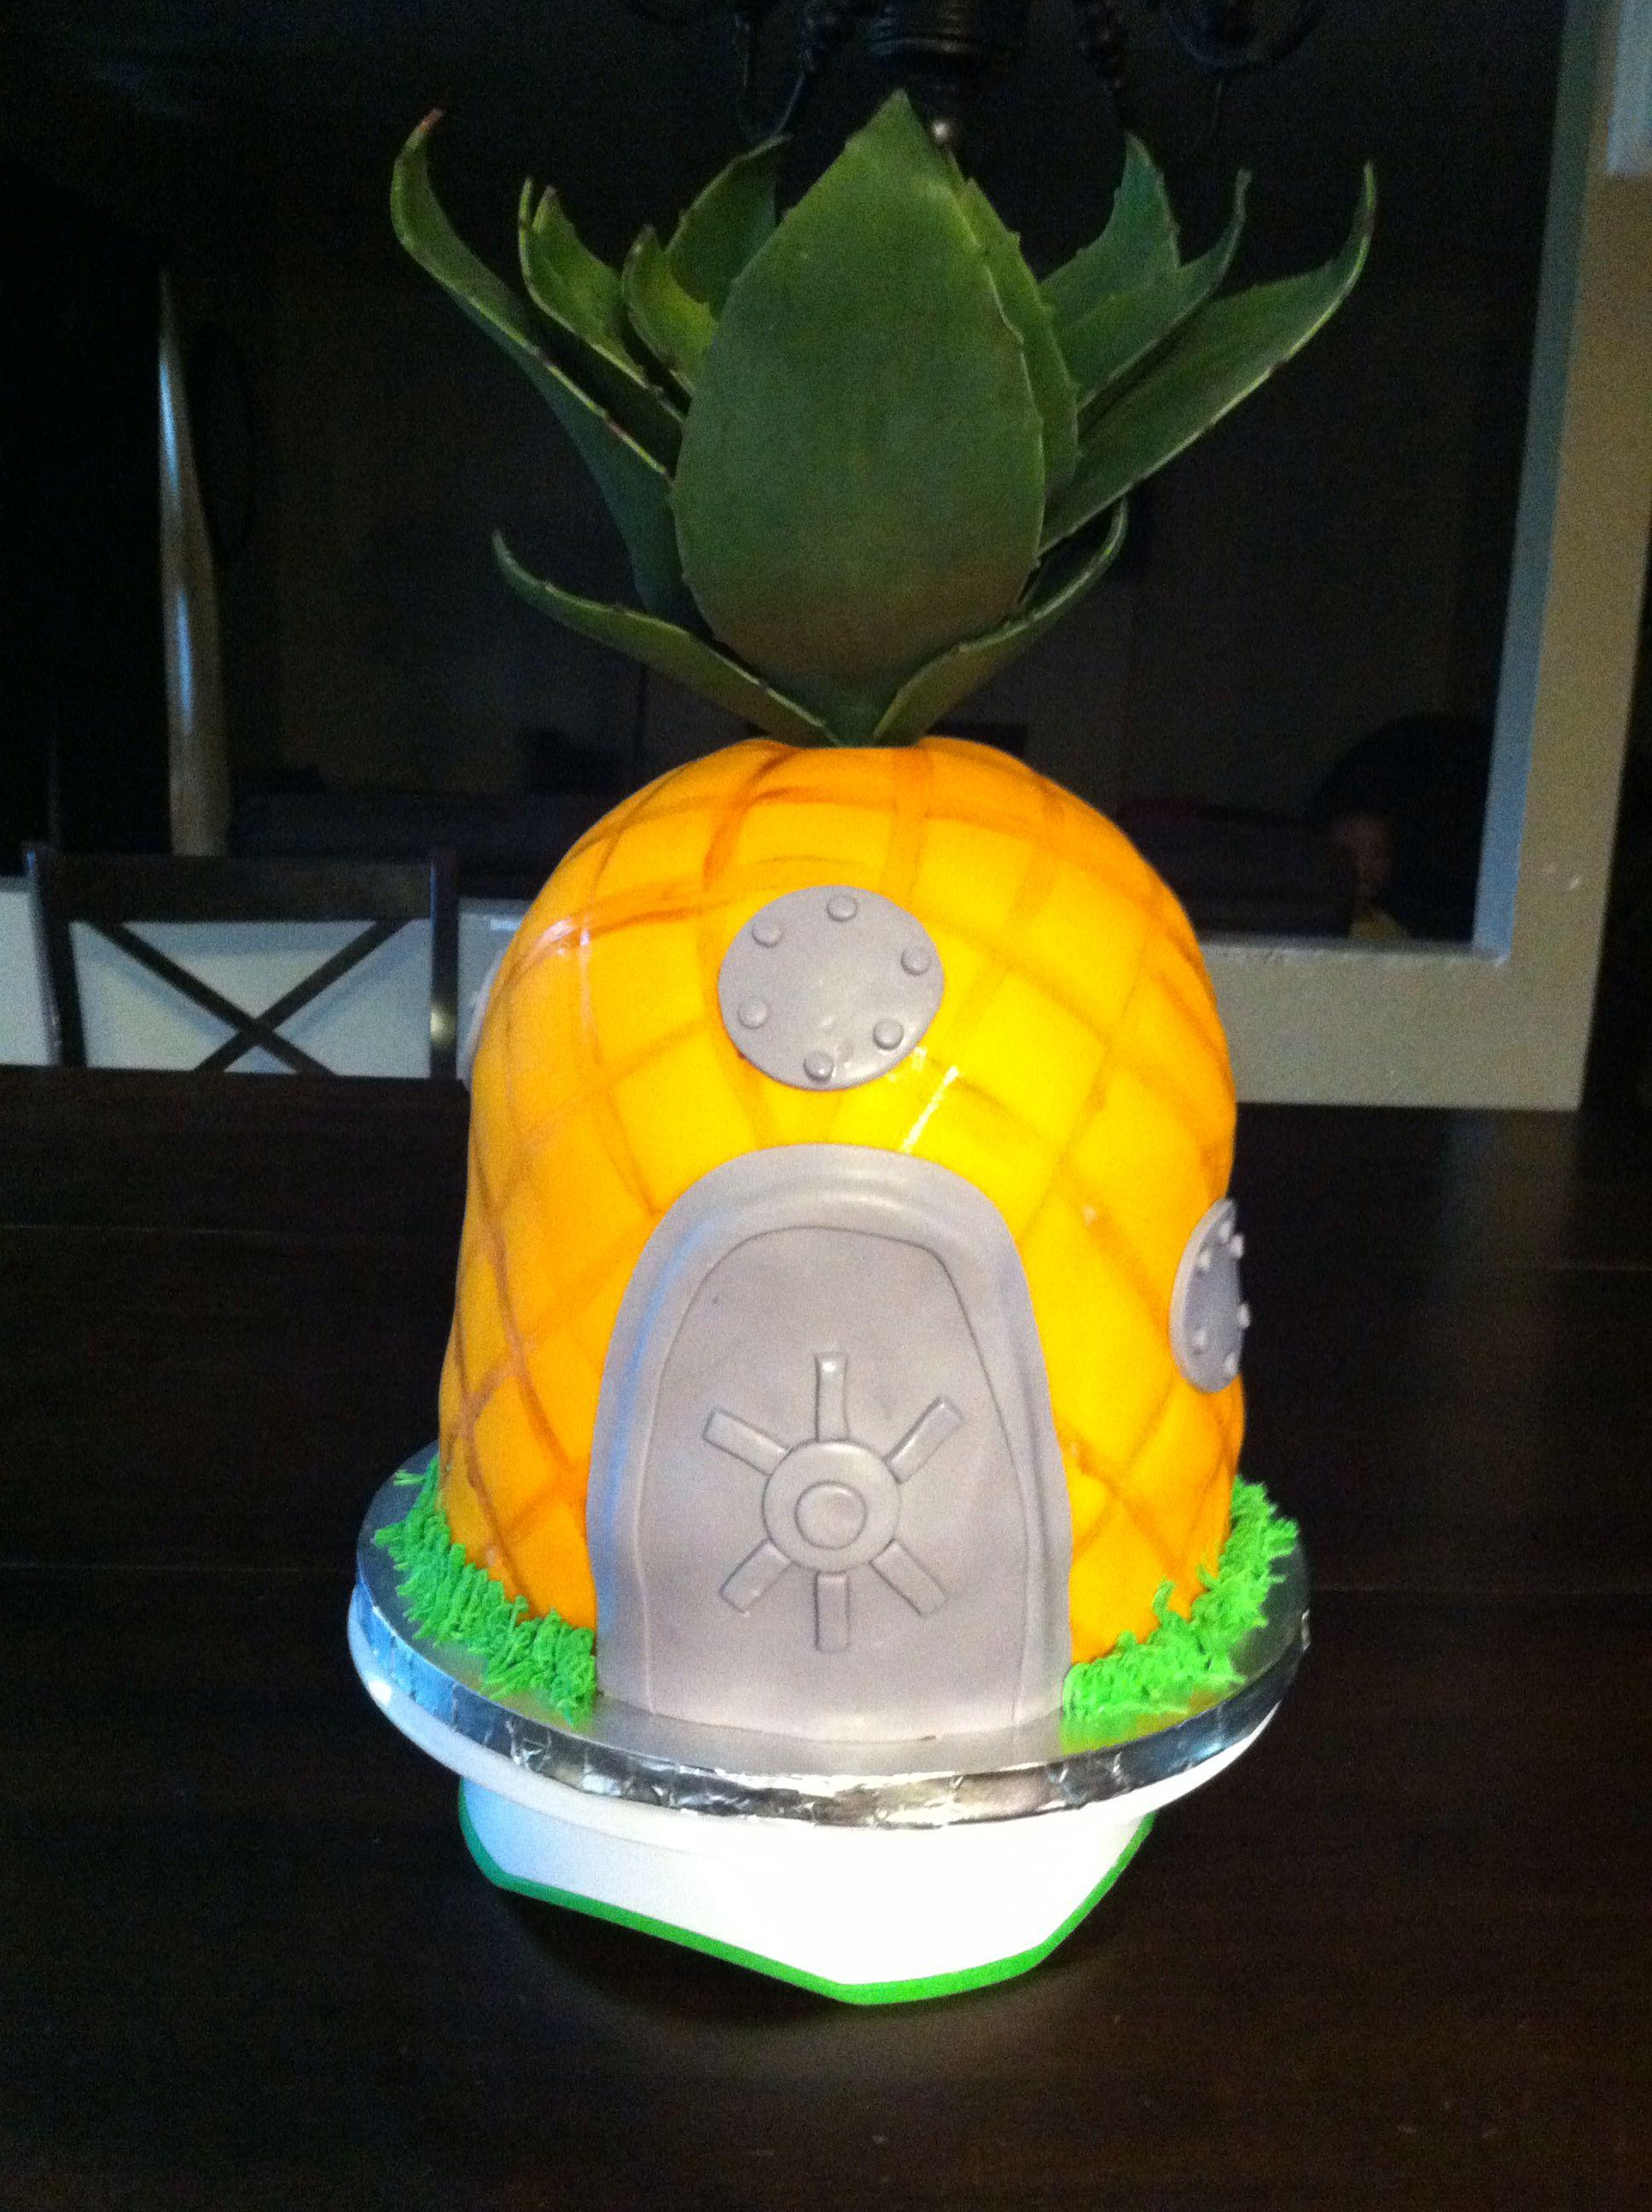 Spongebob Cake By 7 Little Cupcakes In ToledoOhio